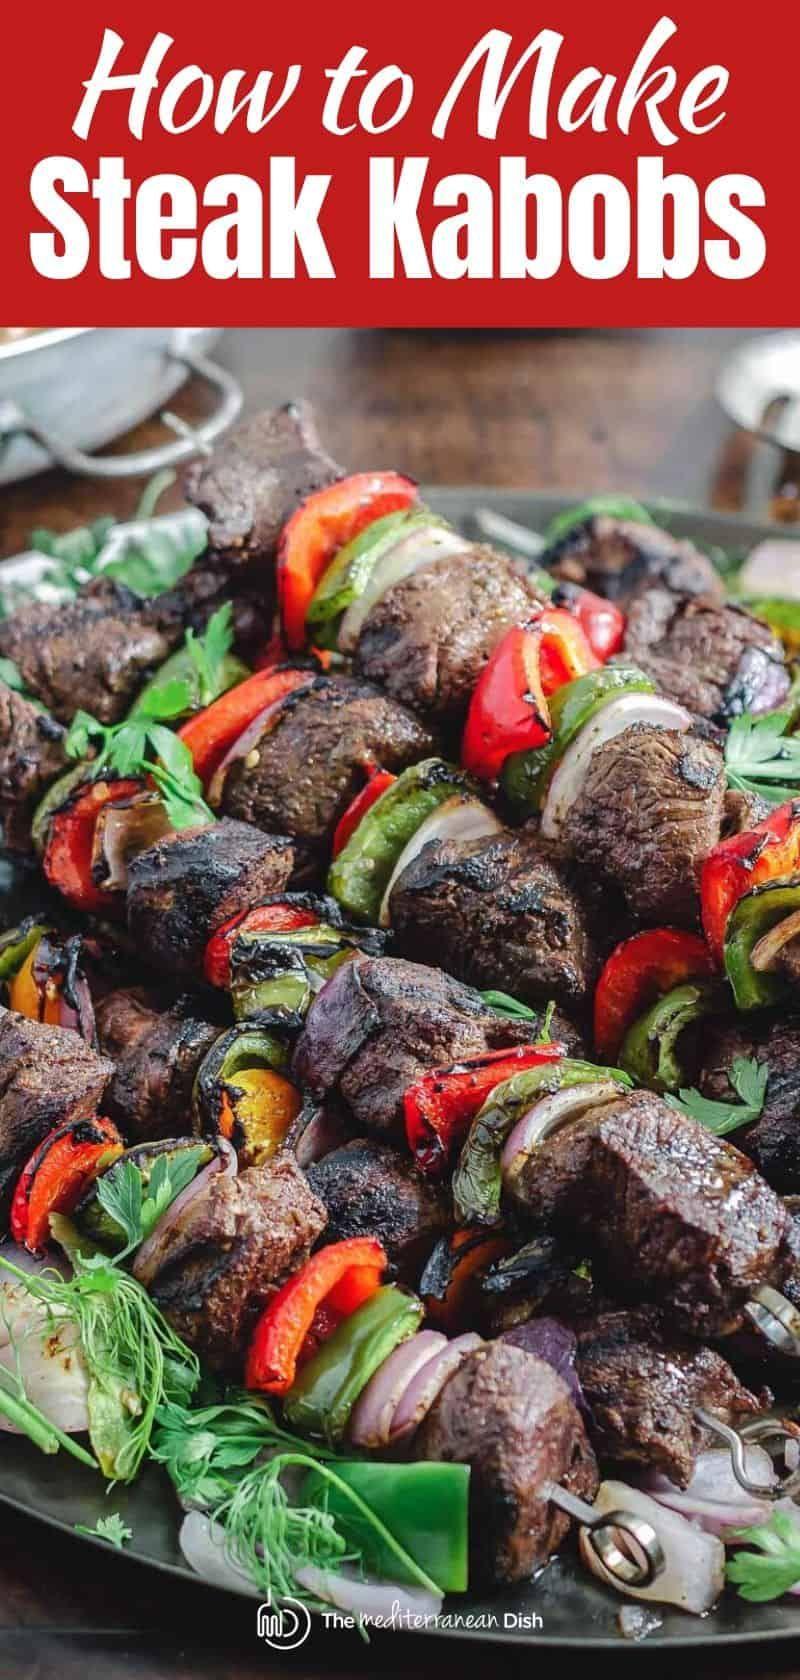 Pin On Mediterranean Dish Recipes